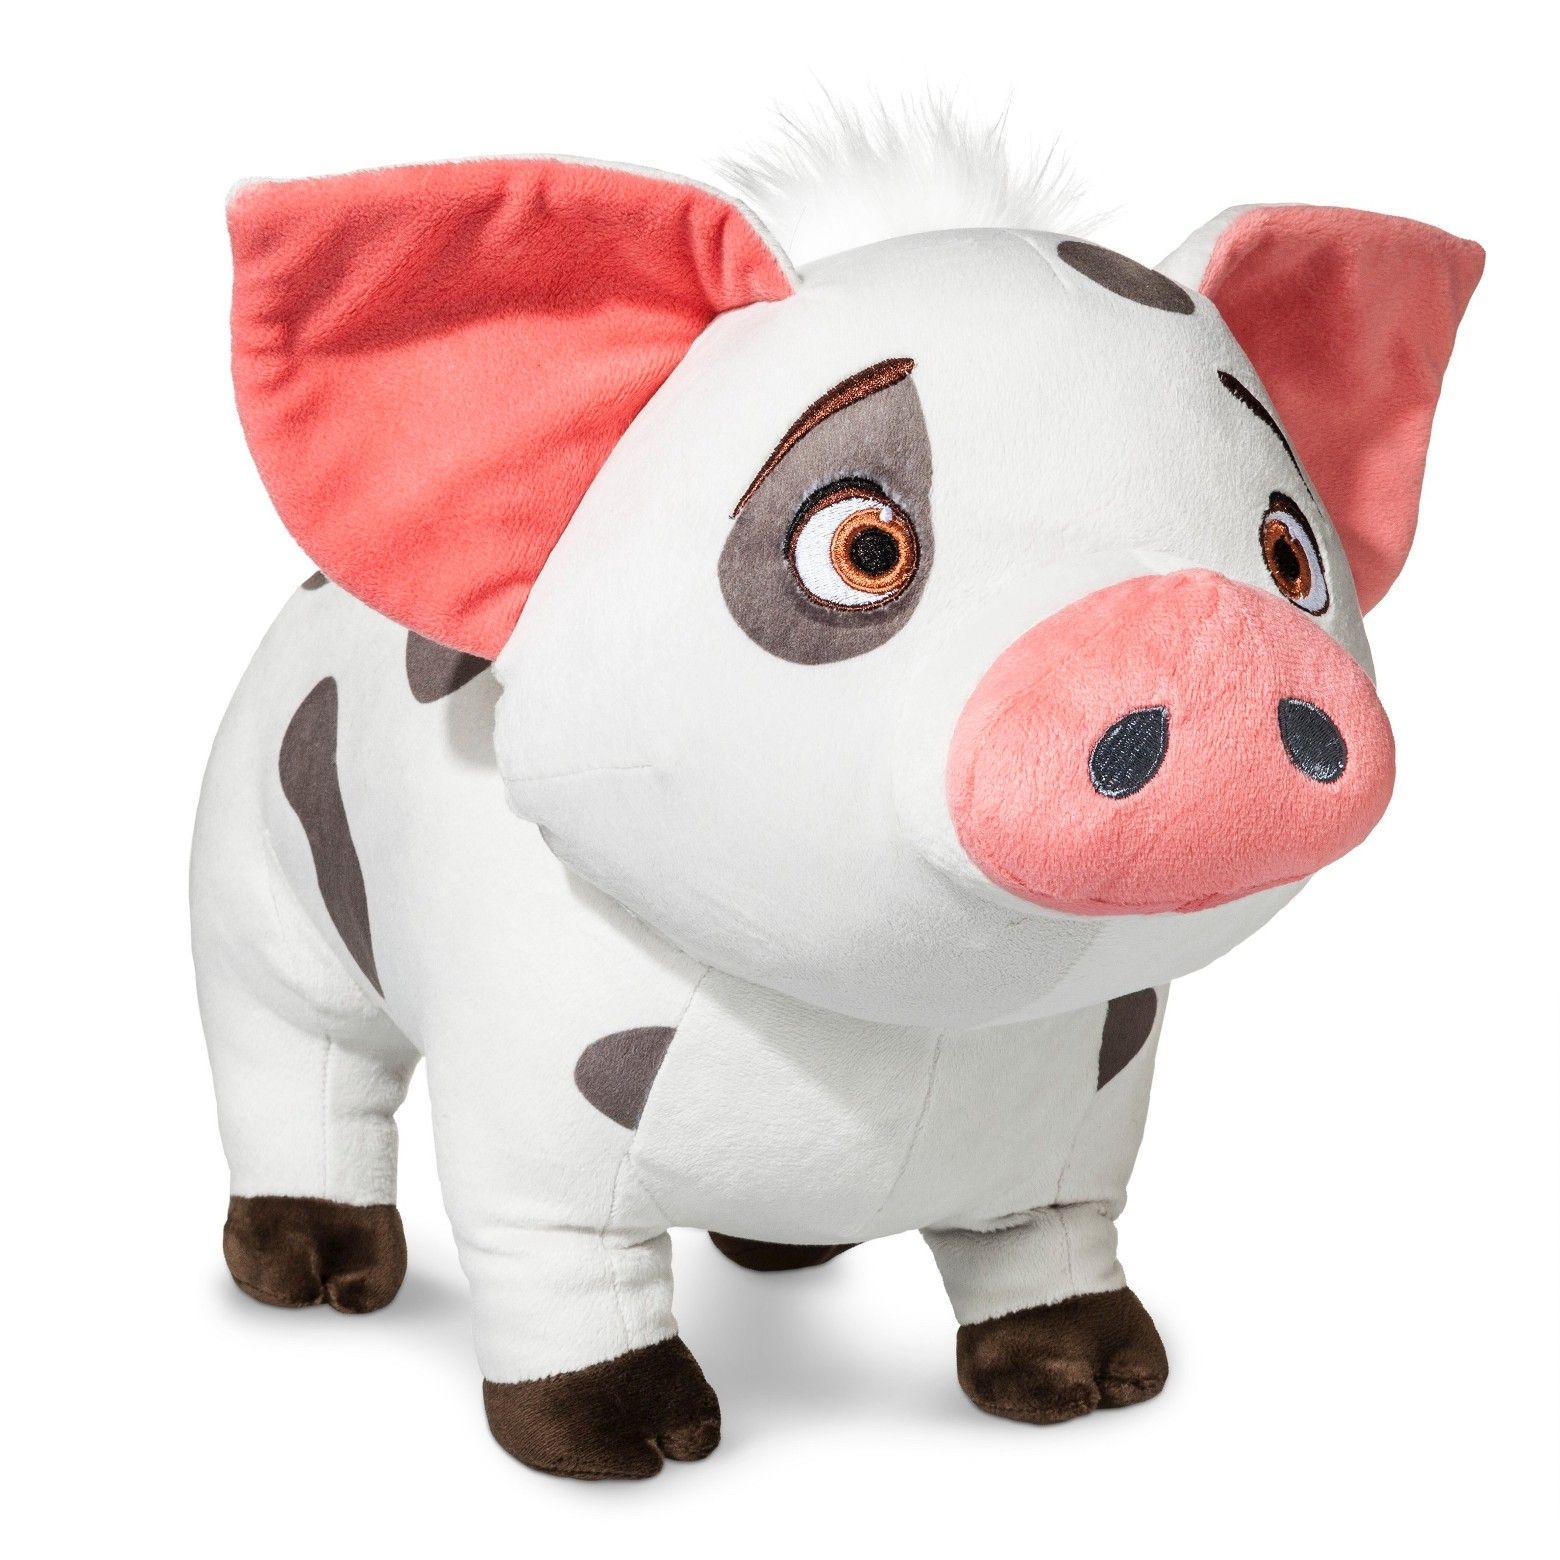 Moana Pua the Pig Pillow Buddy White Disney in 2020